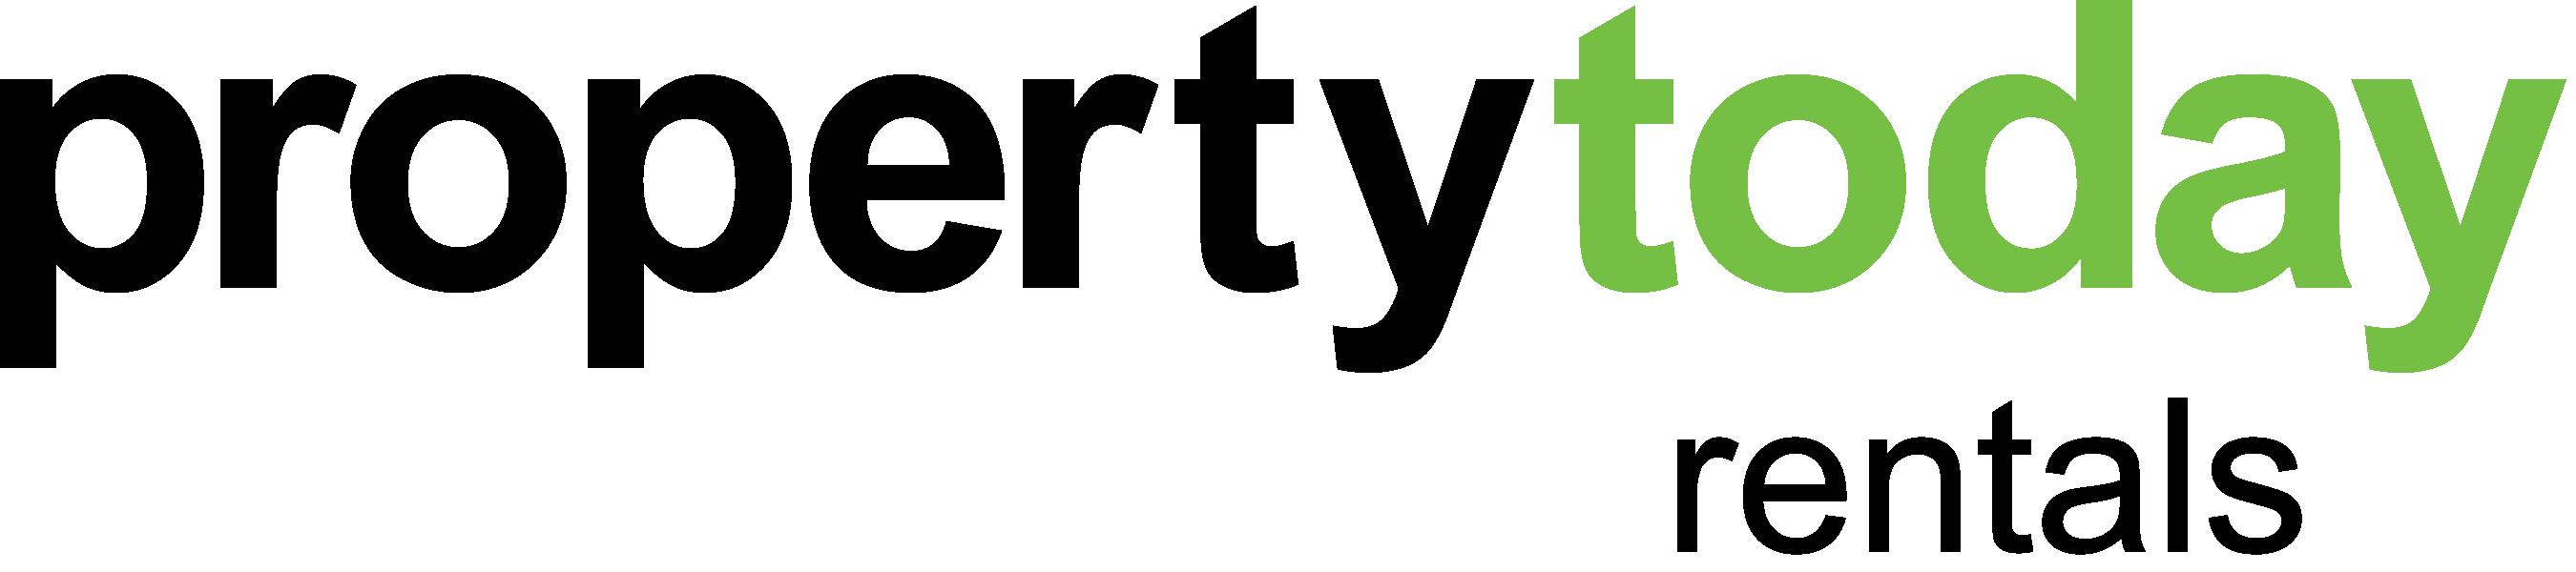 Property Today Logo